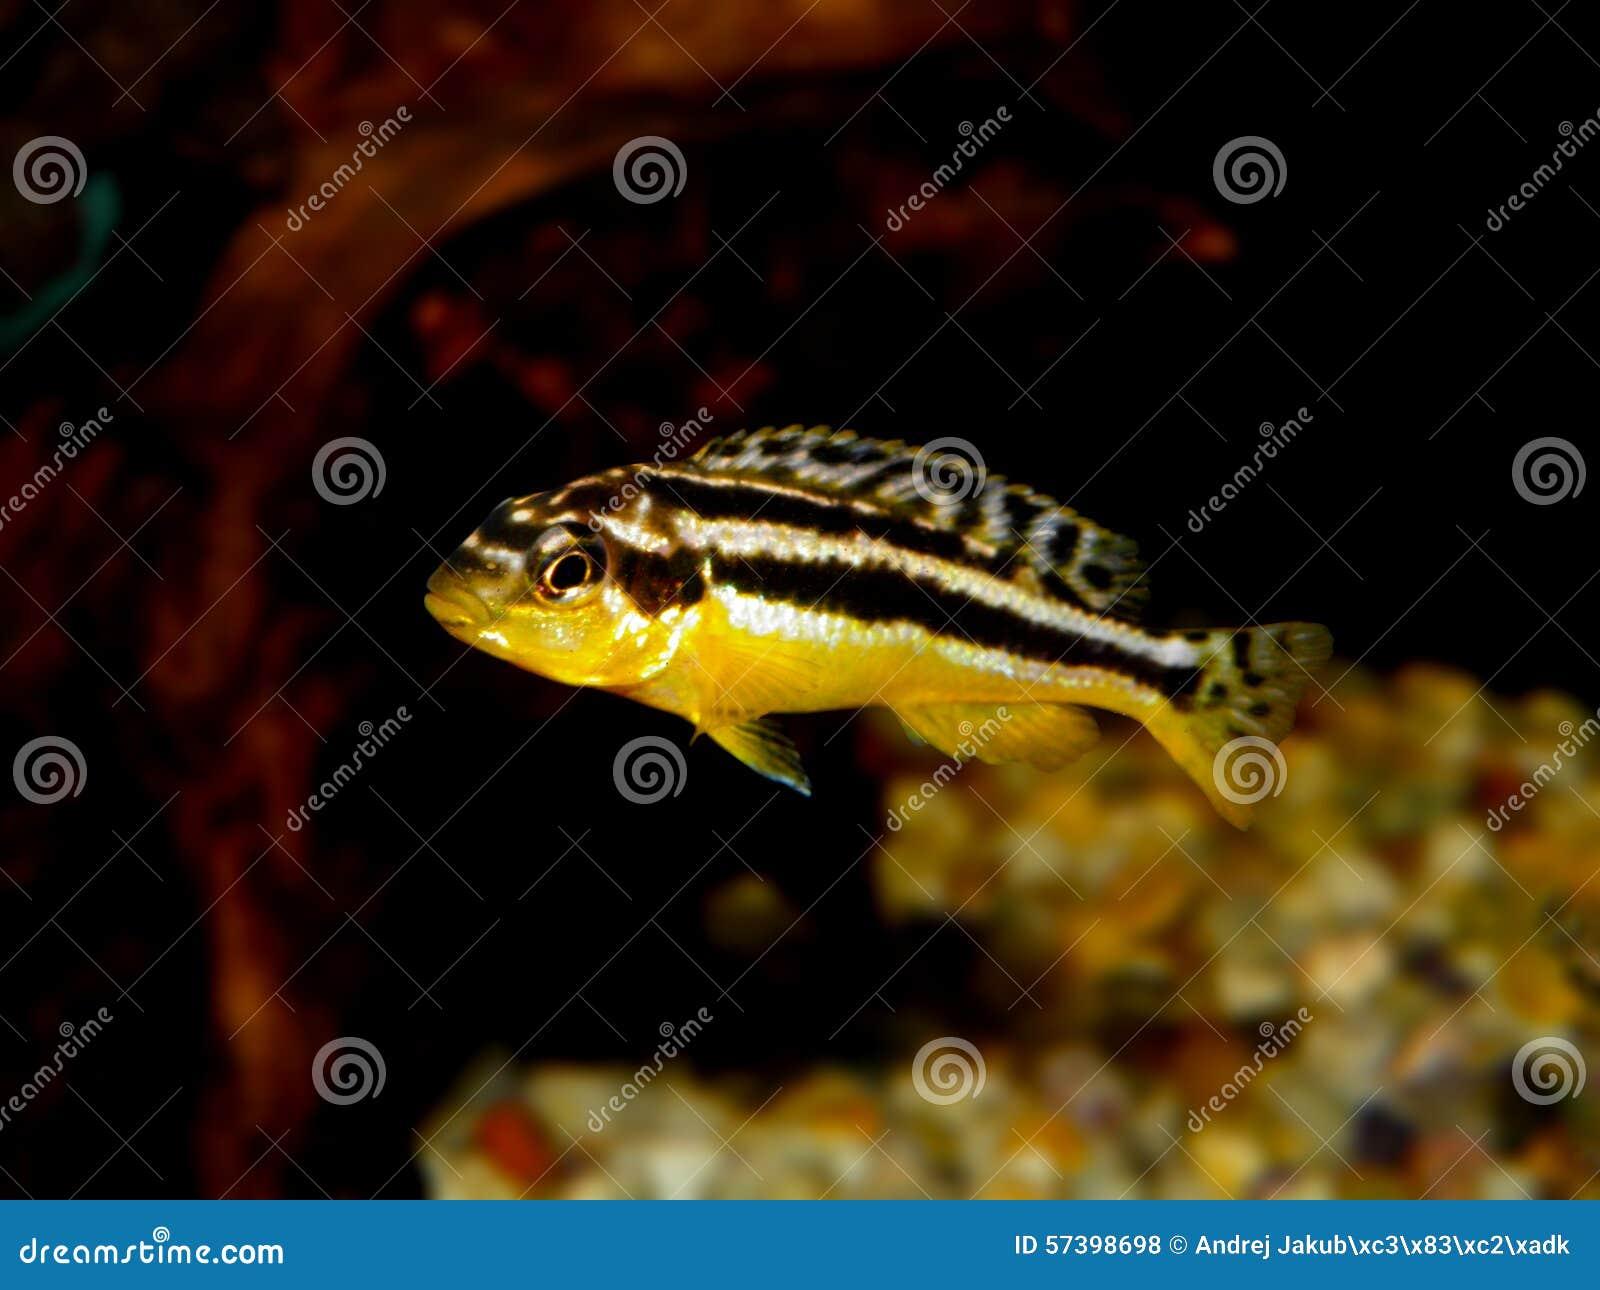 Partij van aquariumvissen van cichlidaefamilie